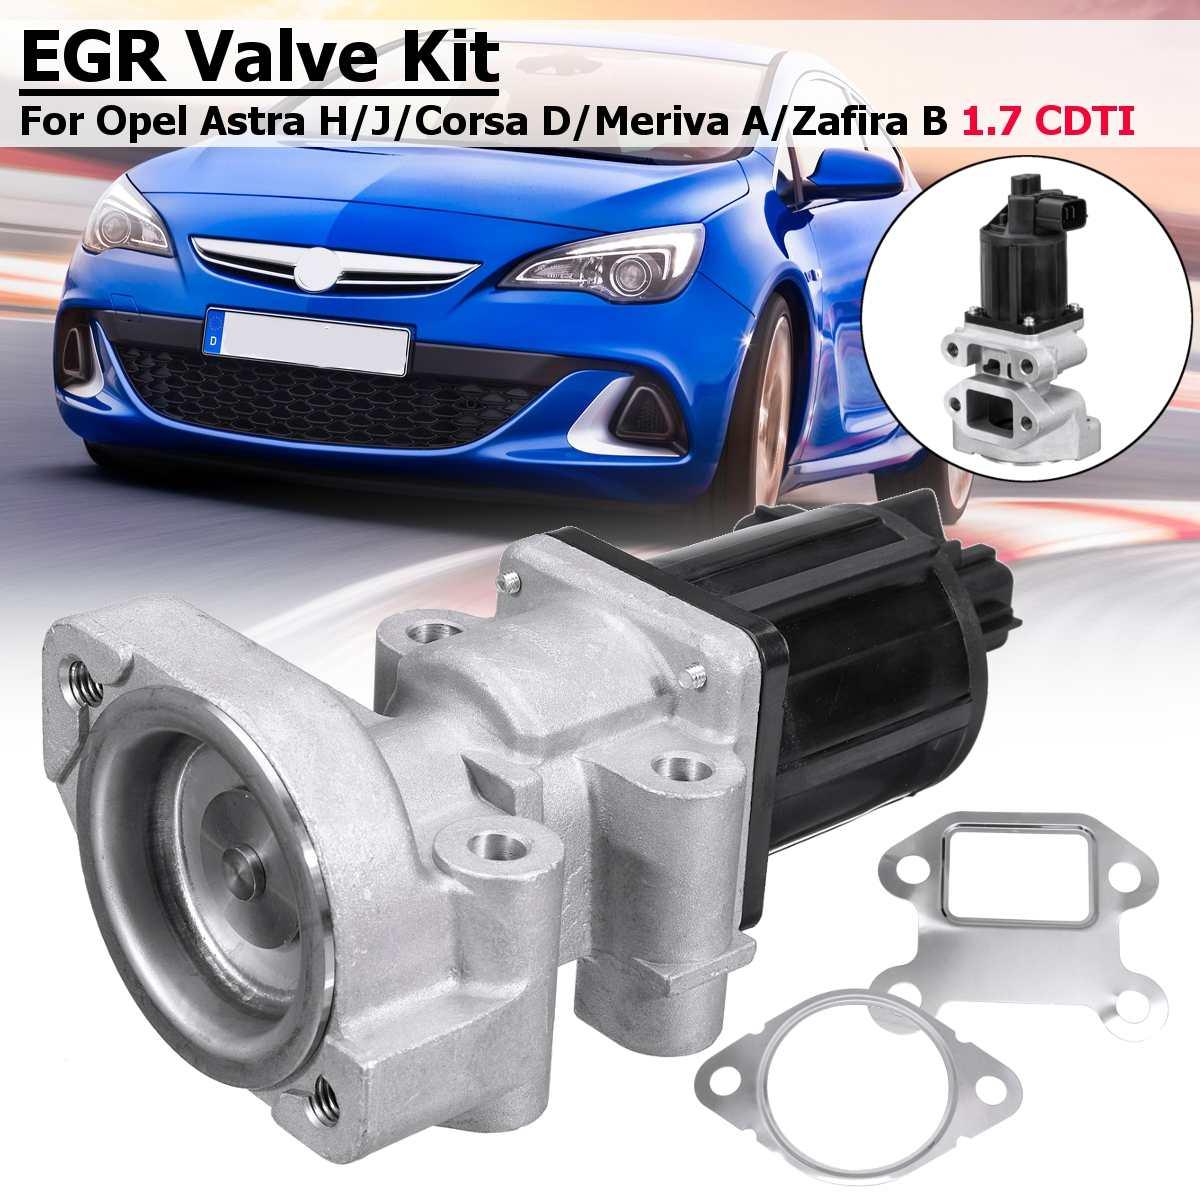 Car Stainless Steel EGR Valve Kit For OPEL Astra H/J  Corsa D Meriva A Zafira B 1.7 CDTI 5851076 97376663 Exhaust Gas  Valve